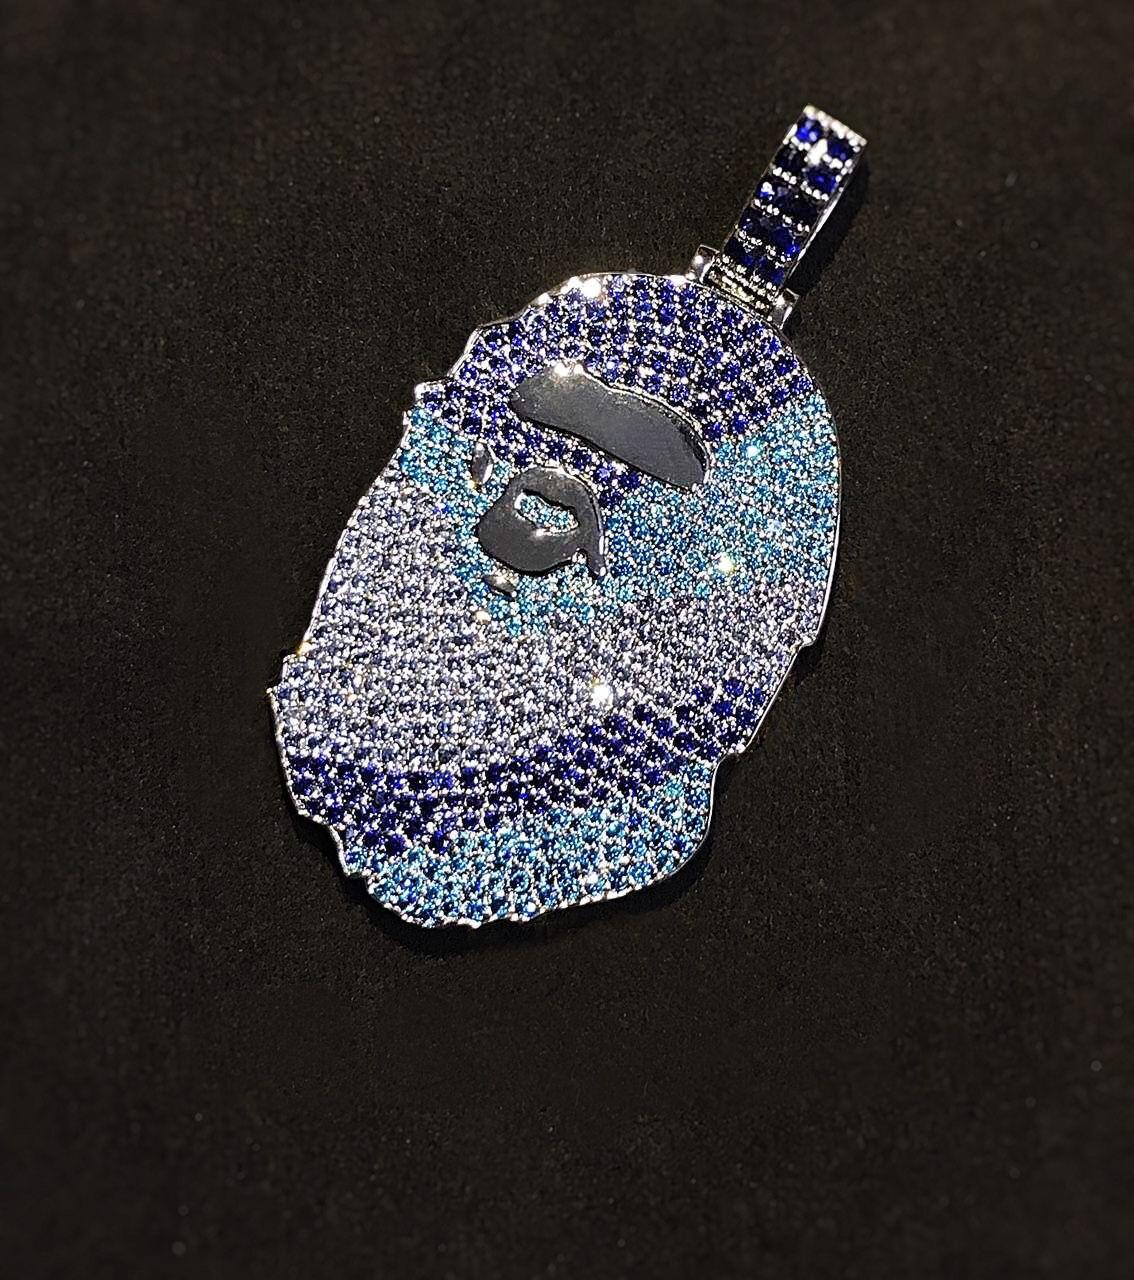 Bape Head Necklace Pendant Chain Micro Pave Setting With Multicolor Diamonds In Blue Camo Just Like The Bape Ca Jesus Piece Custom Jewelry Personalized Jewelry